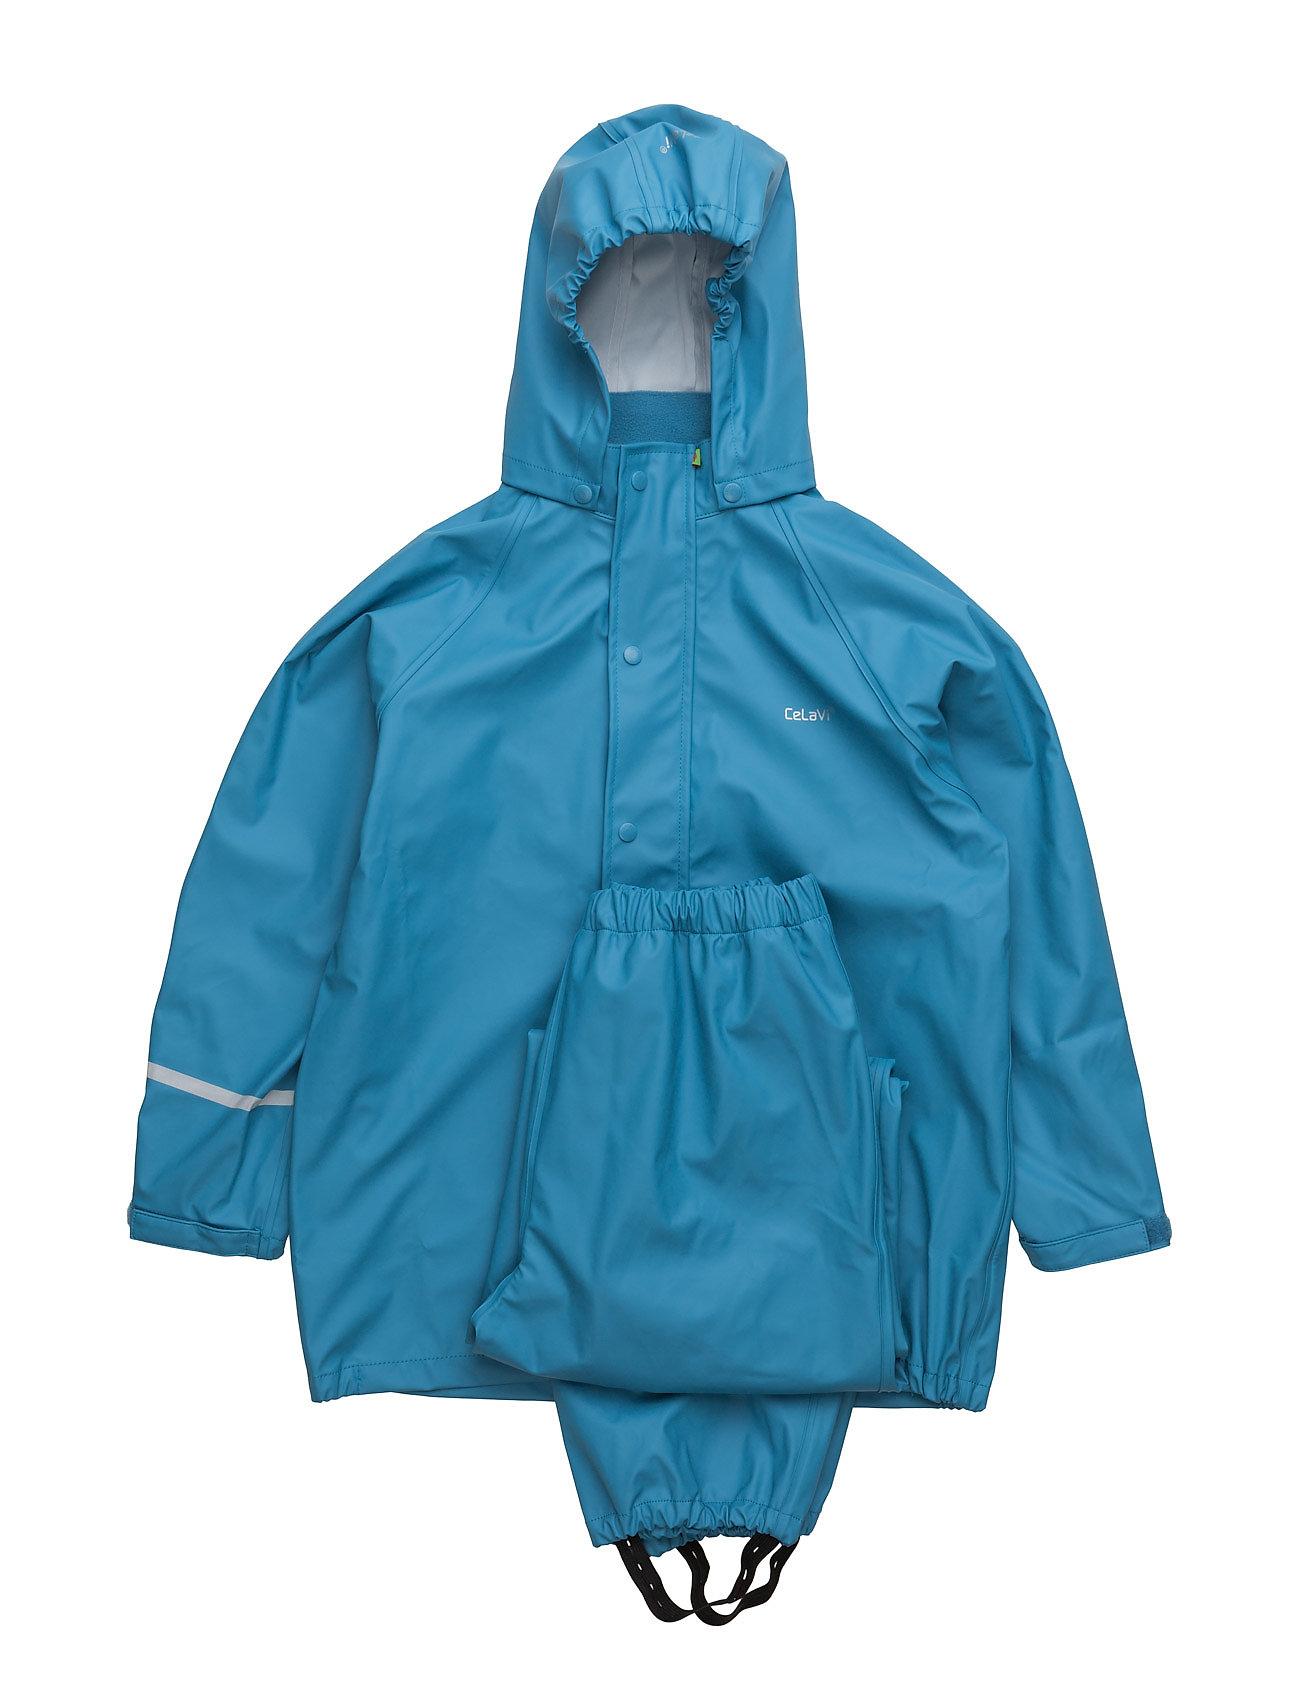 Image of Basci Rainwear Set, Solid Regntøj Blå CeLaVi (3473867863)